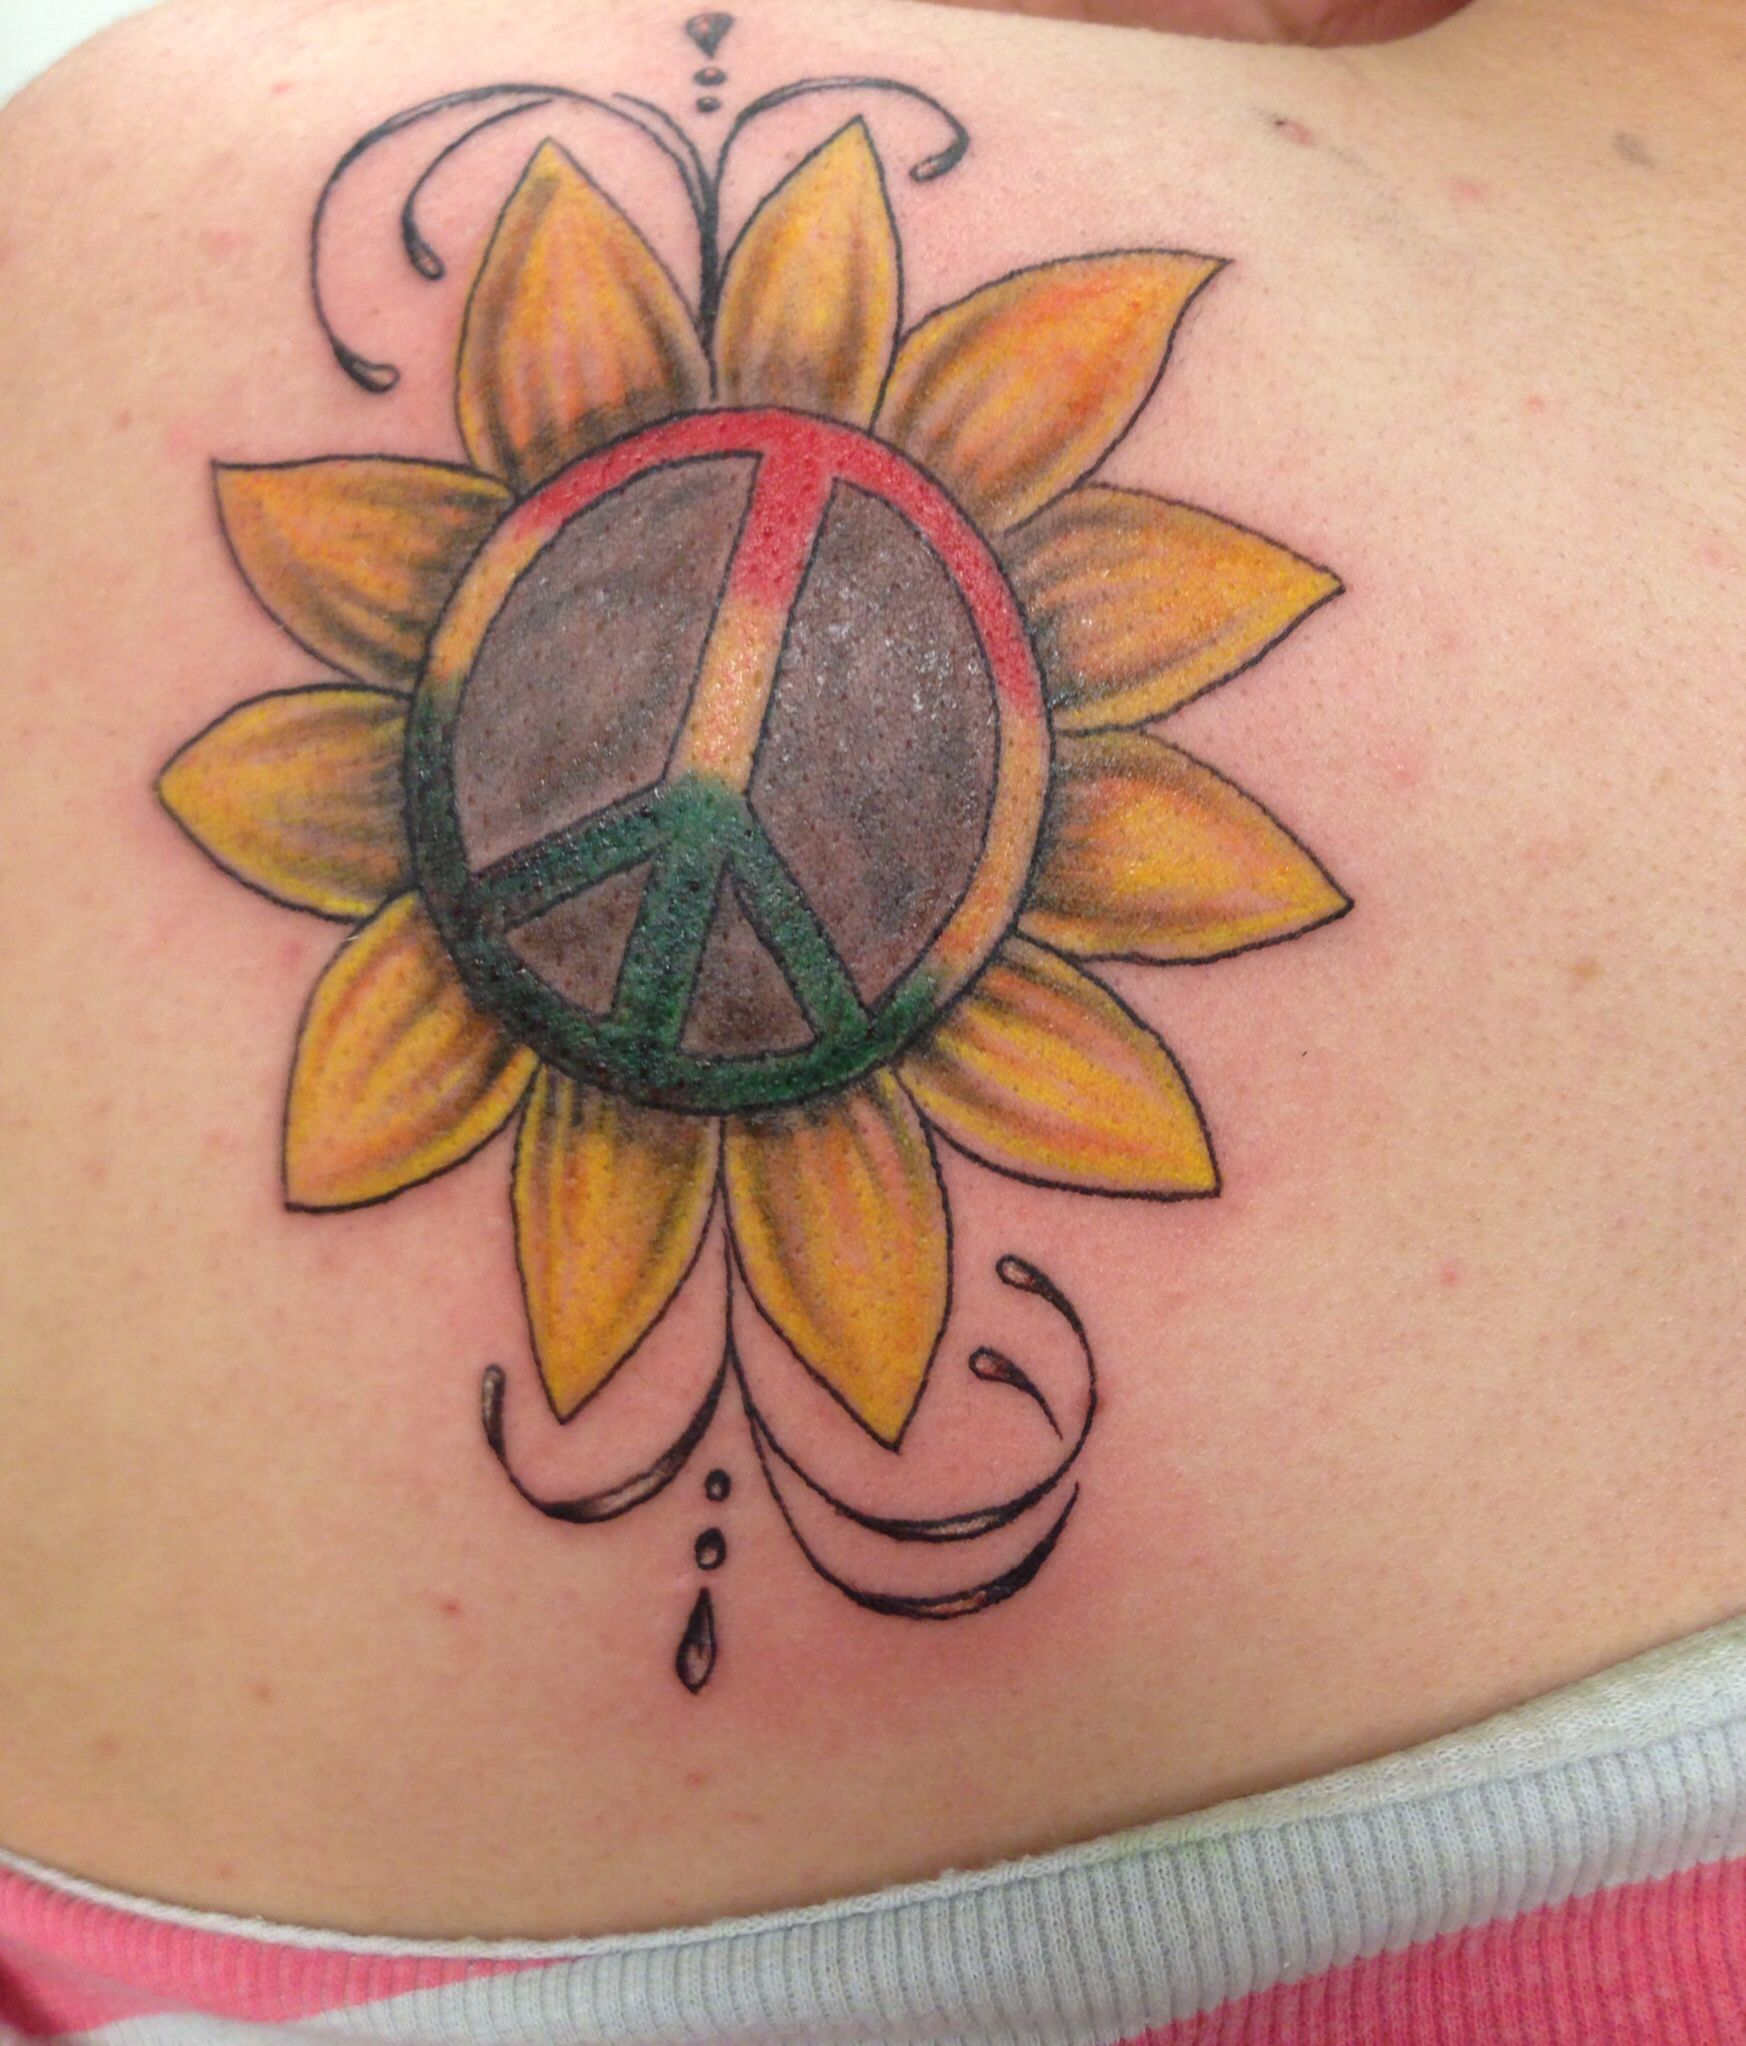 Peace Sign Tattoo With Regard To Tattoo Art Tattoo A To: Sunflower With Rasta Peace Sign Inside